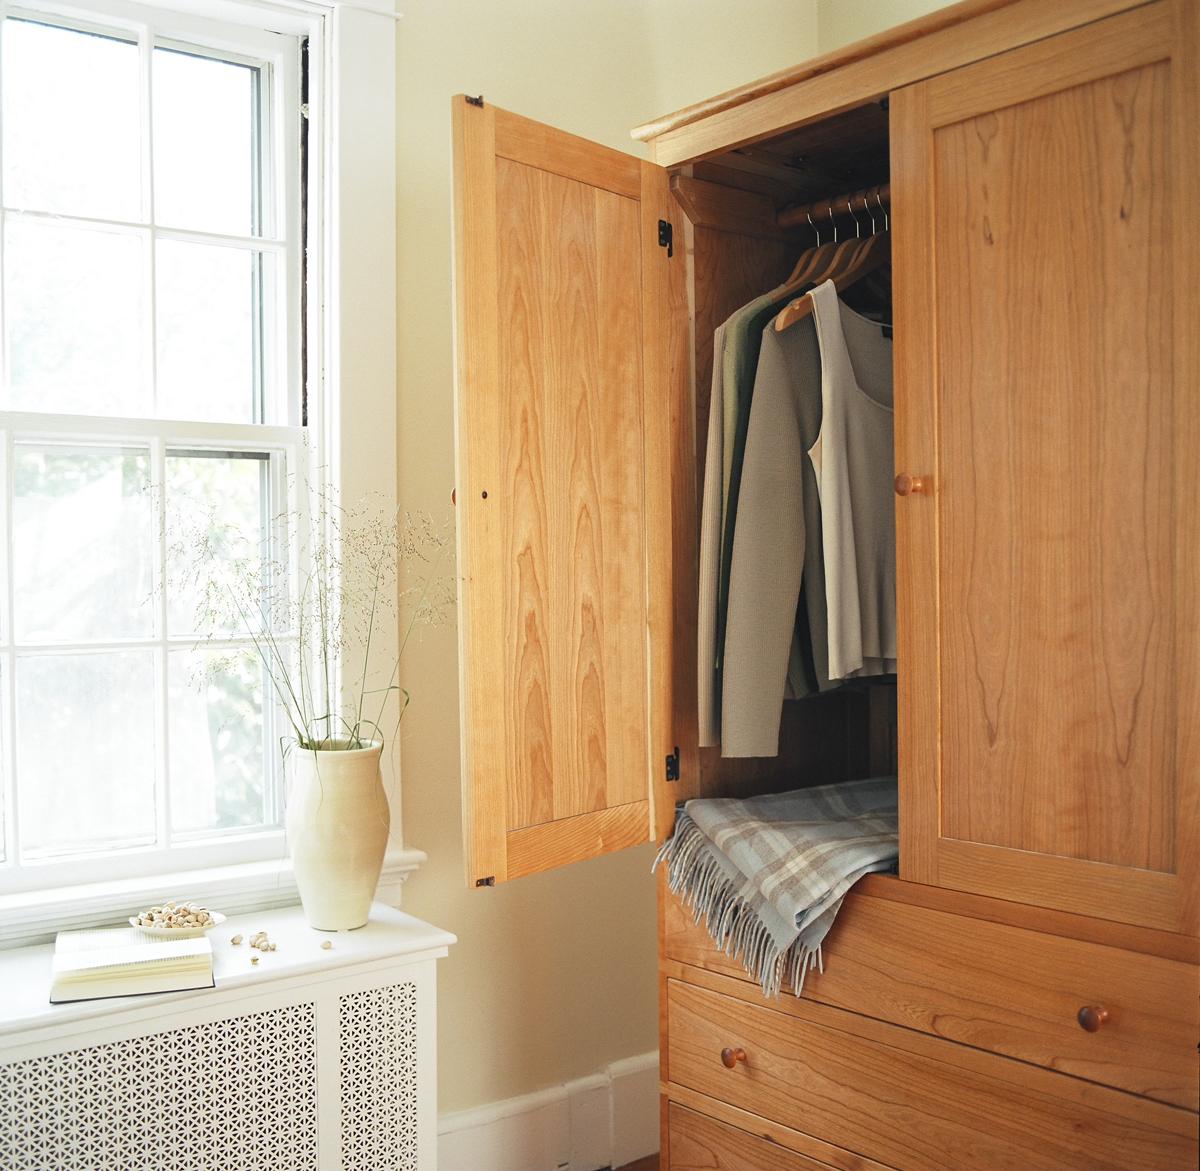 wardrobe-drawer-chest-vertical-dresser-bedroom